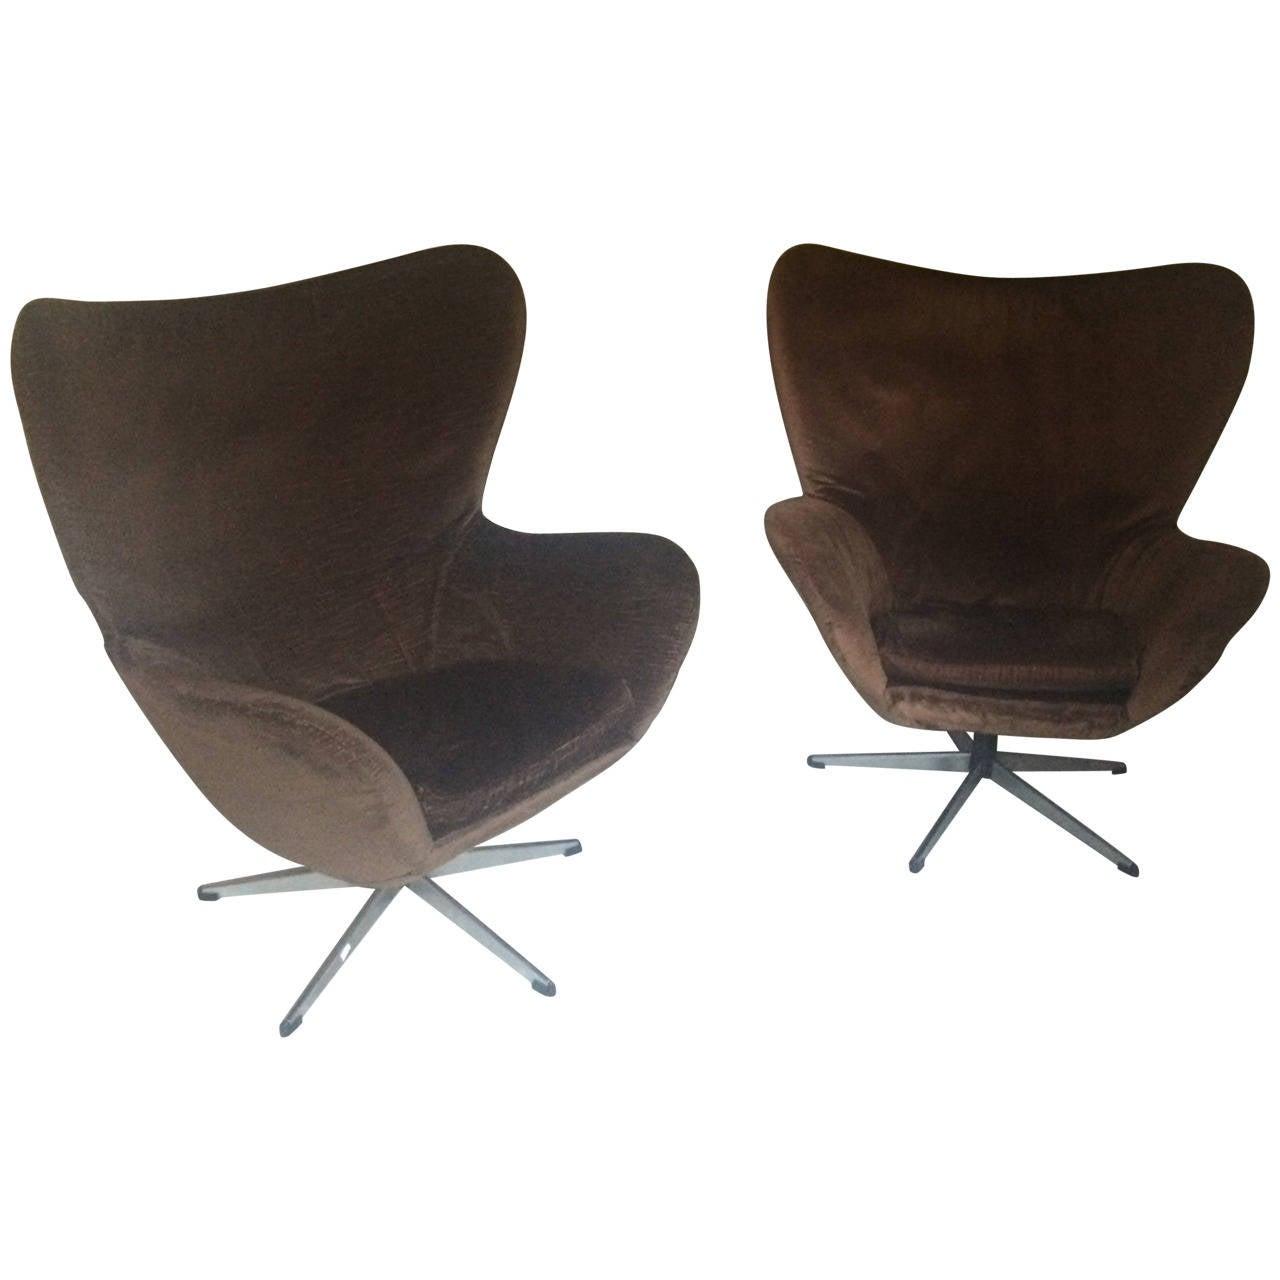 Pair Of 1960s Arne Jacobsen Egg Chairs At 1stdibs